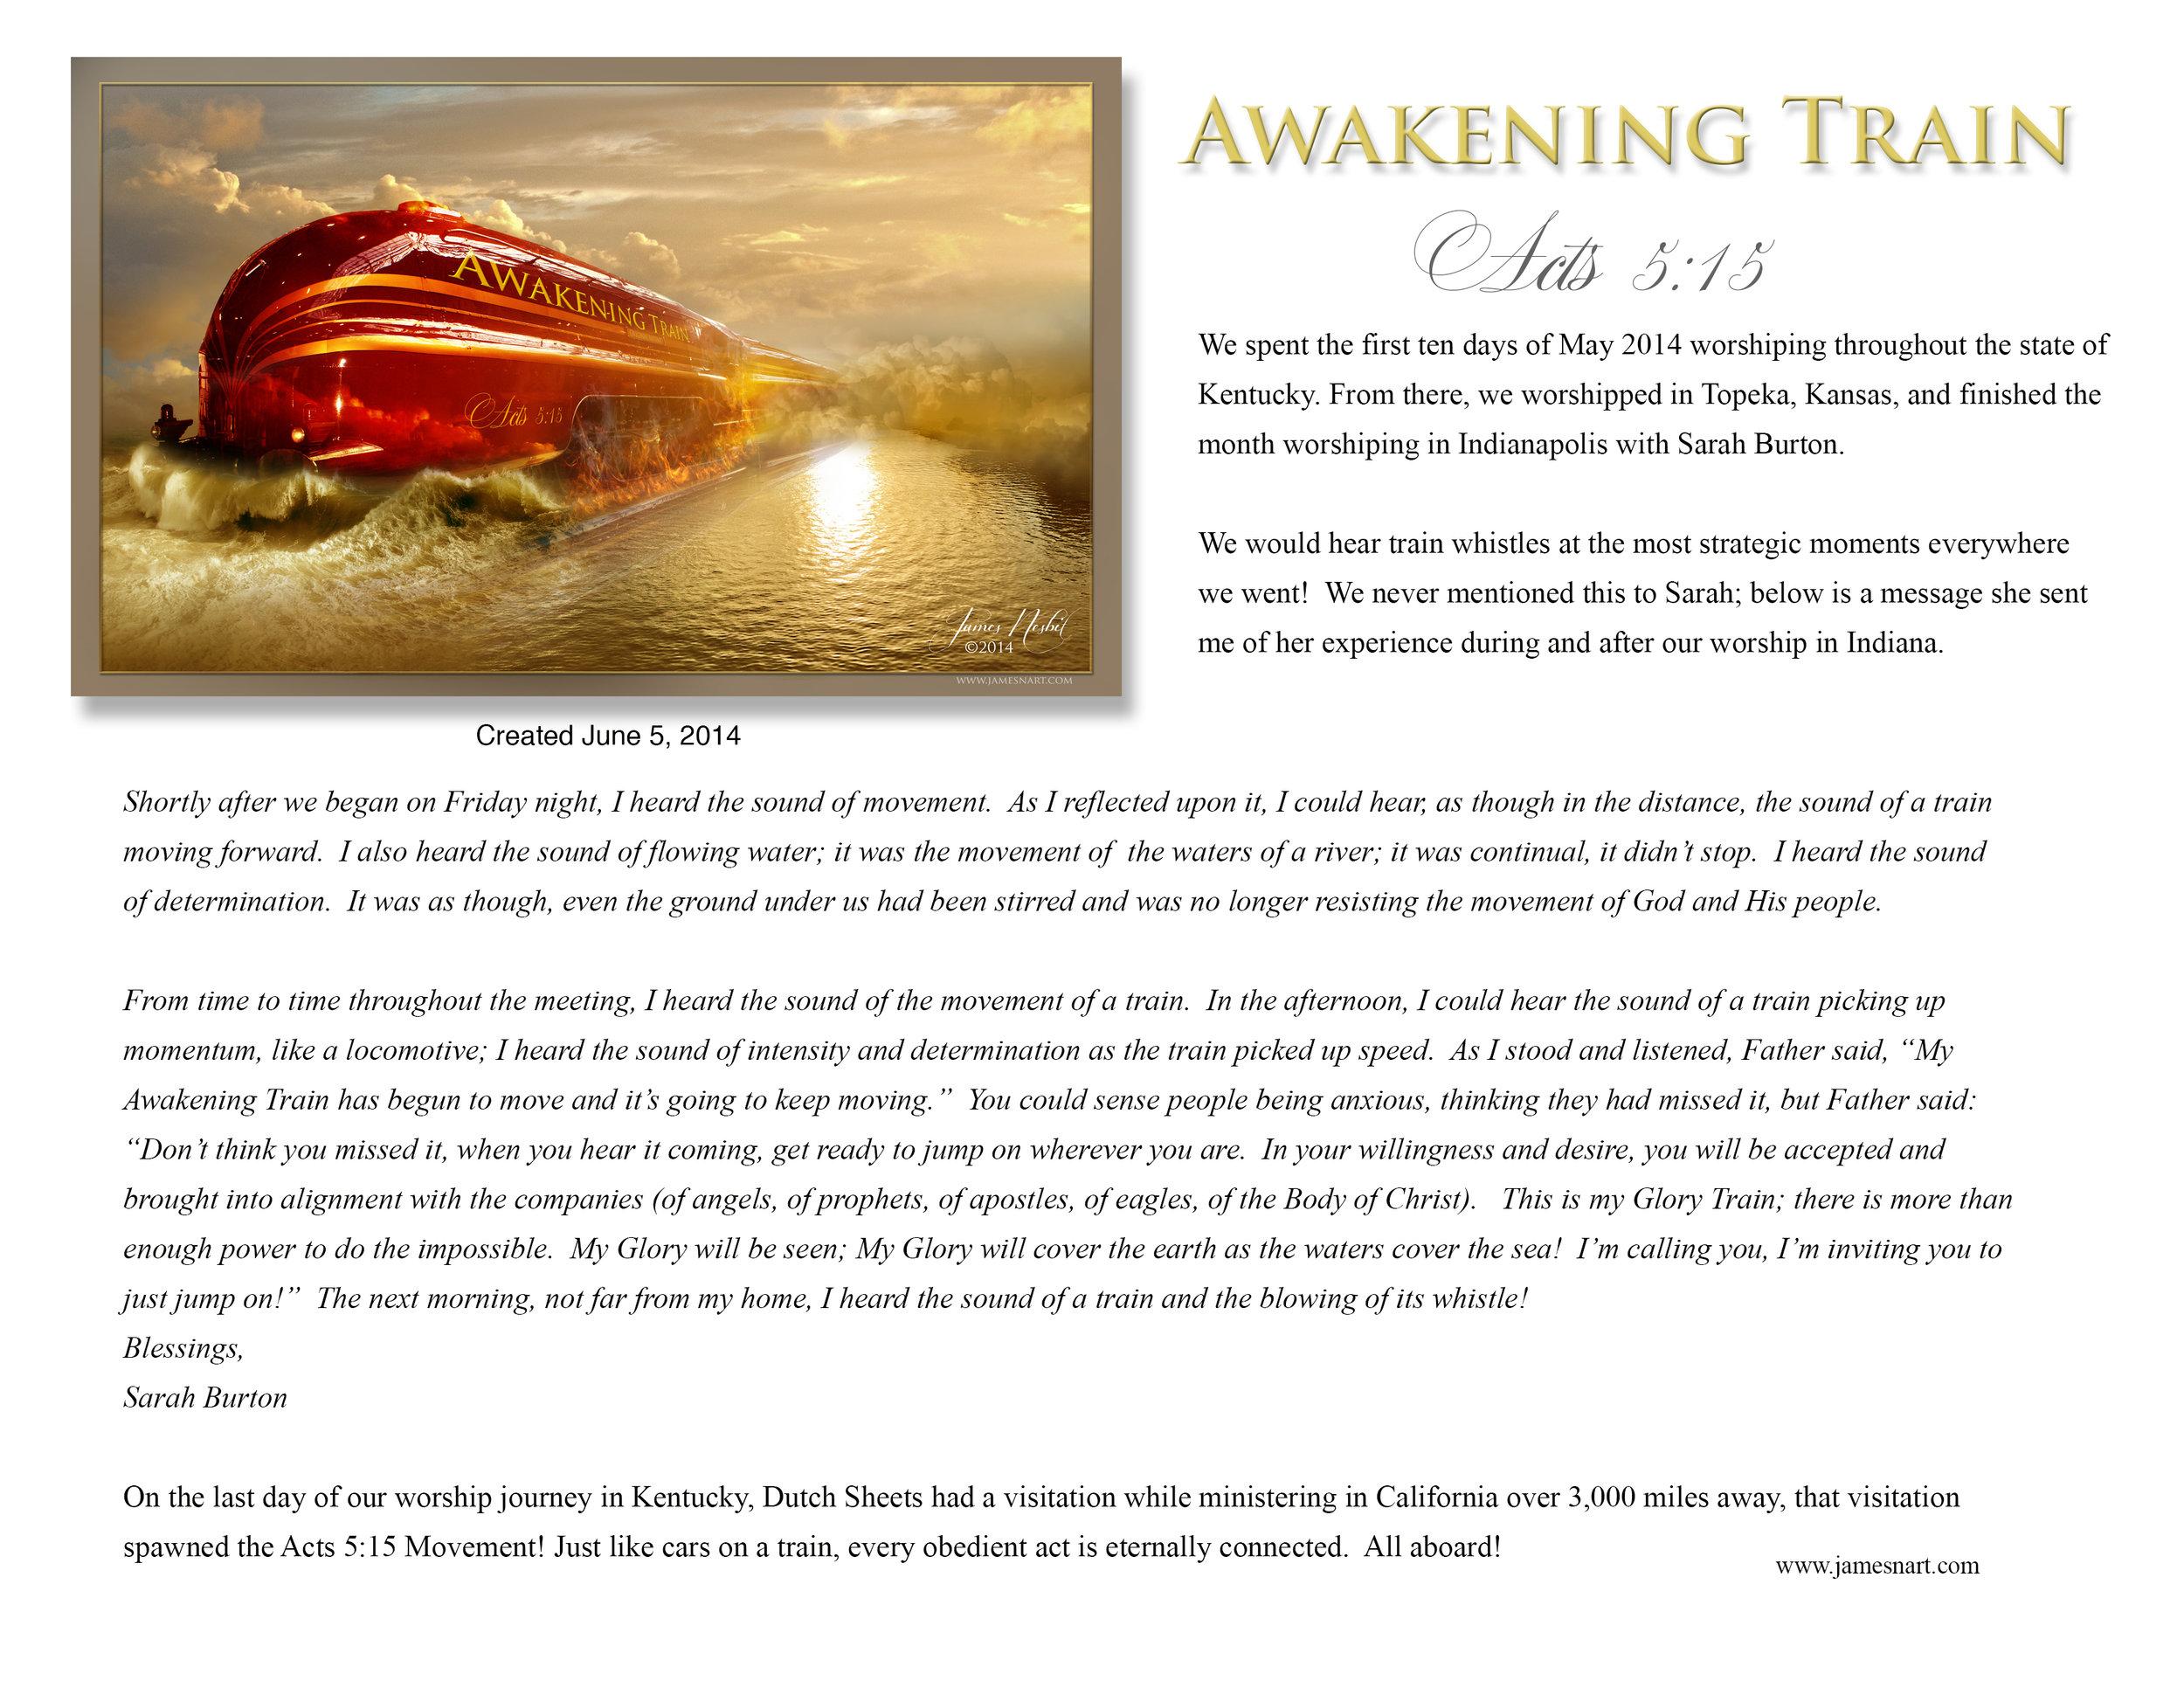 Awakening Train Description.jpg